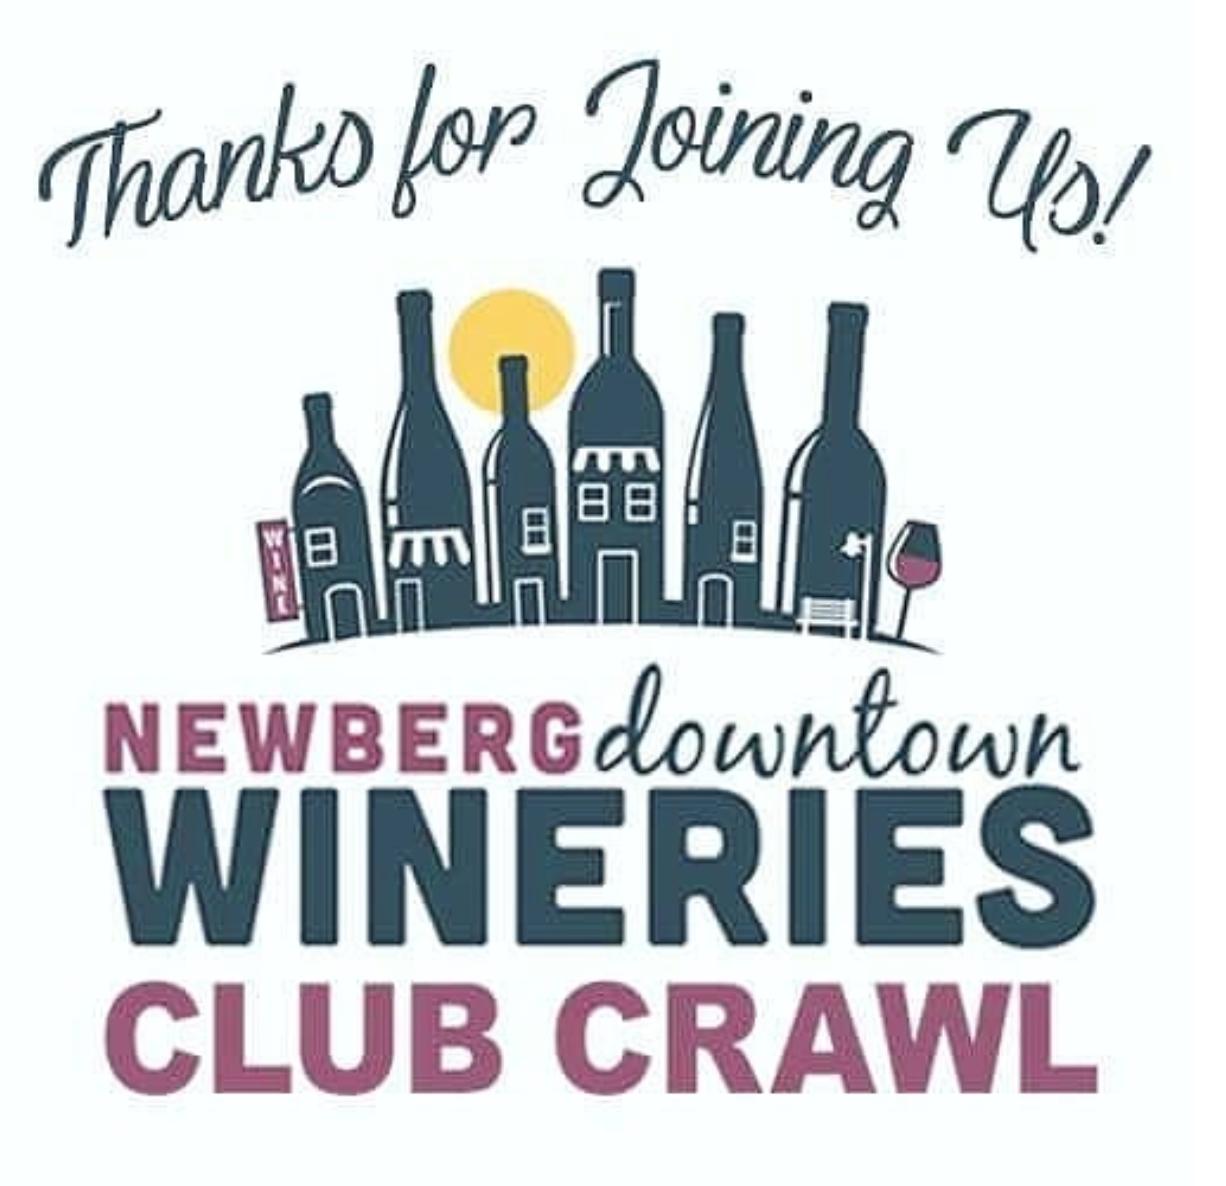 Thank You Square - Club Crawl 2019.PNG